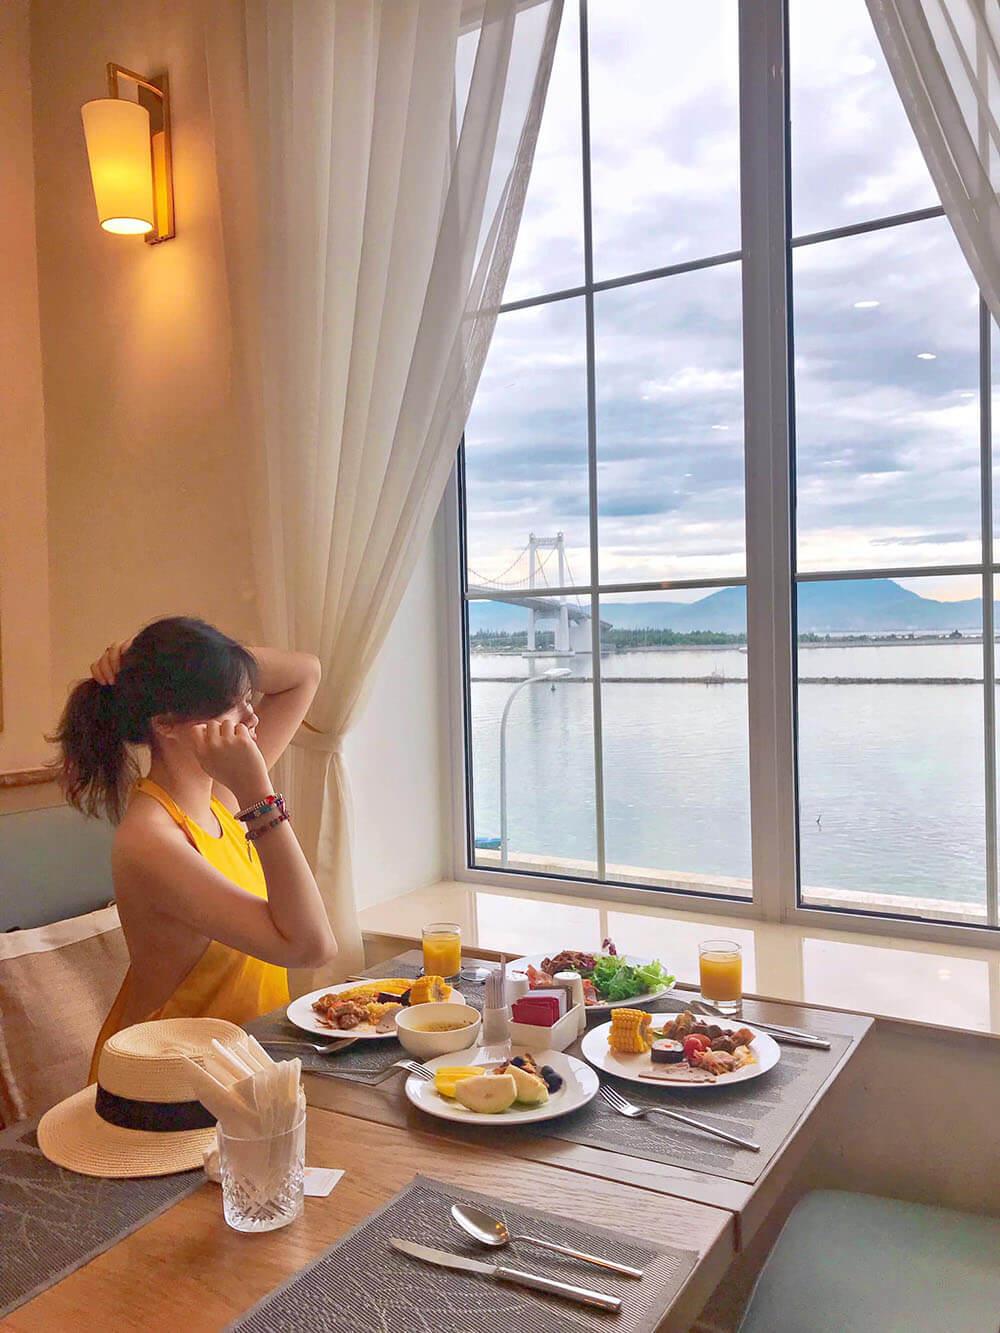 Danang Golden Bay Review Chuyen Du Lich Hoi An Da Nang Chanh Sa 3n2d 05